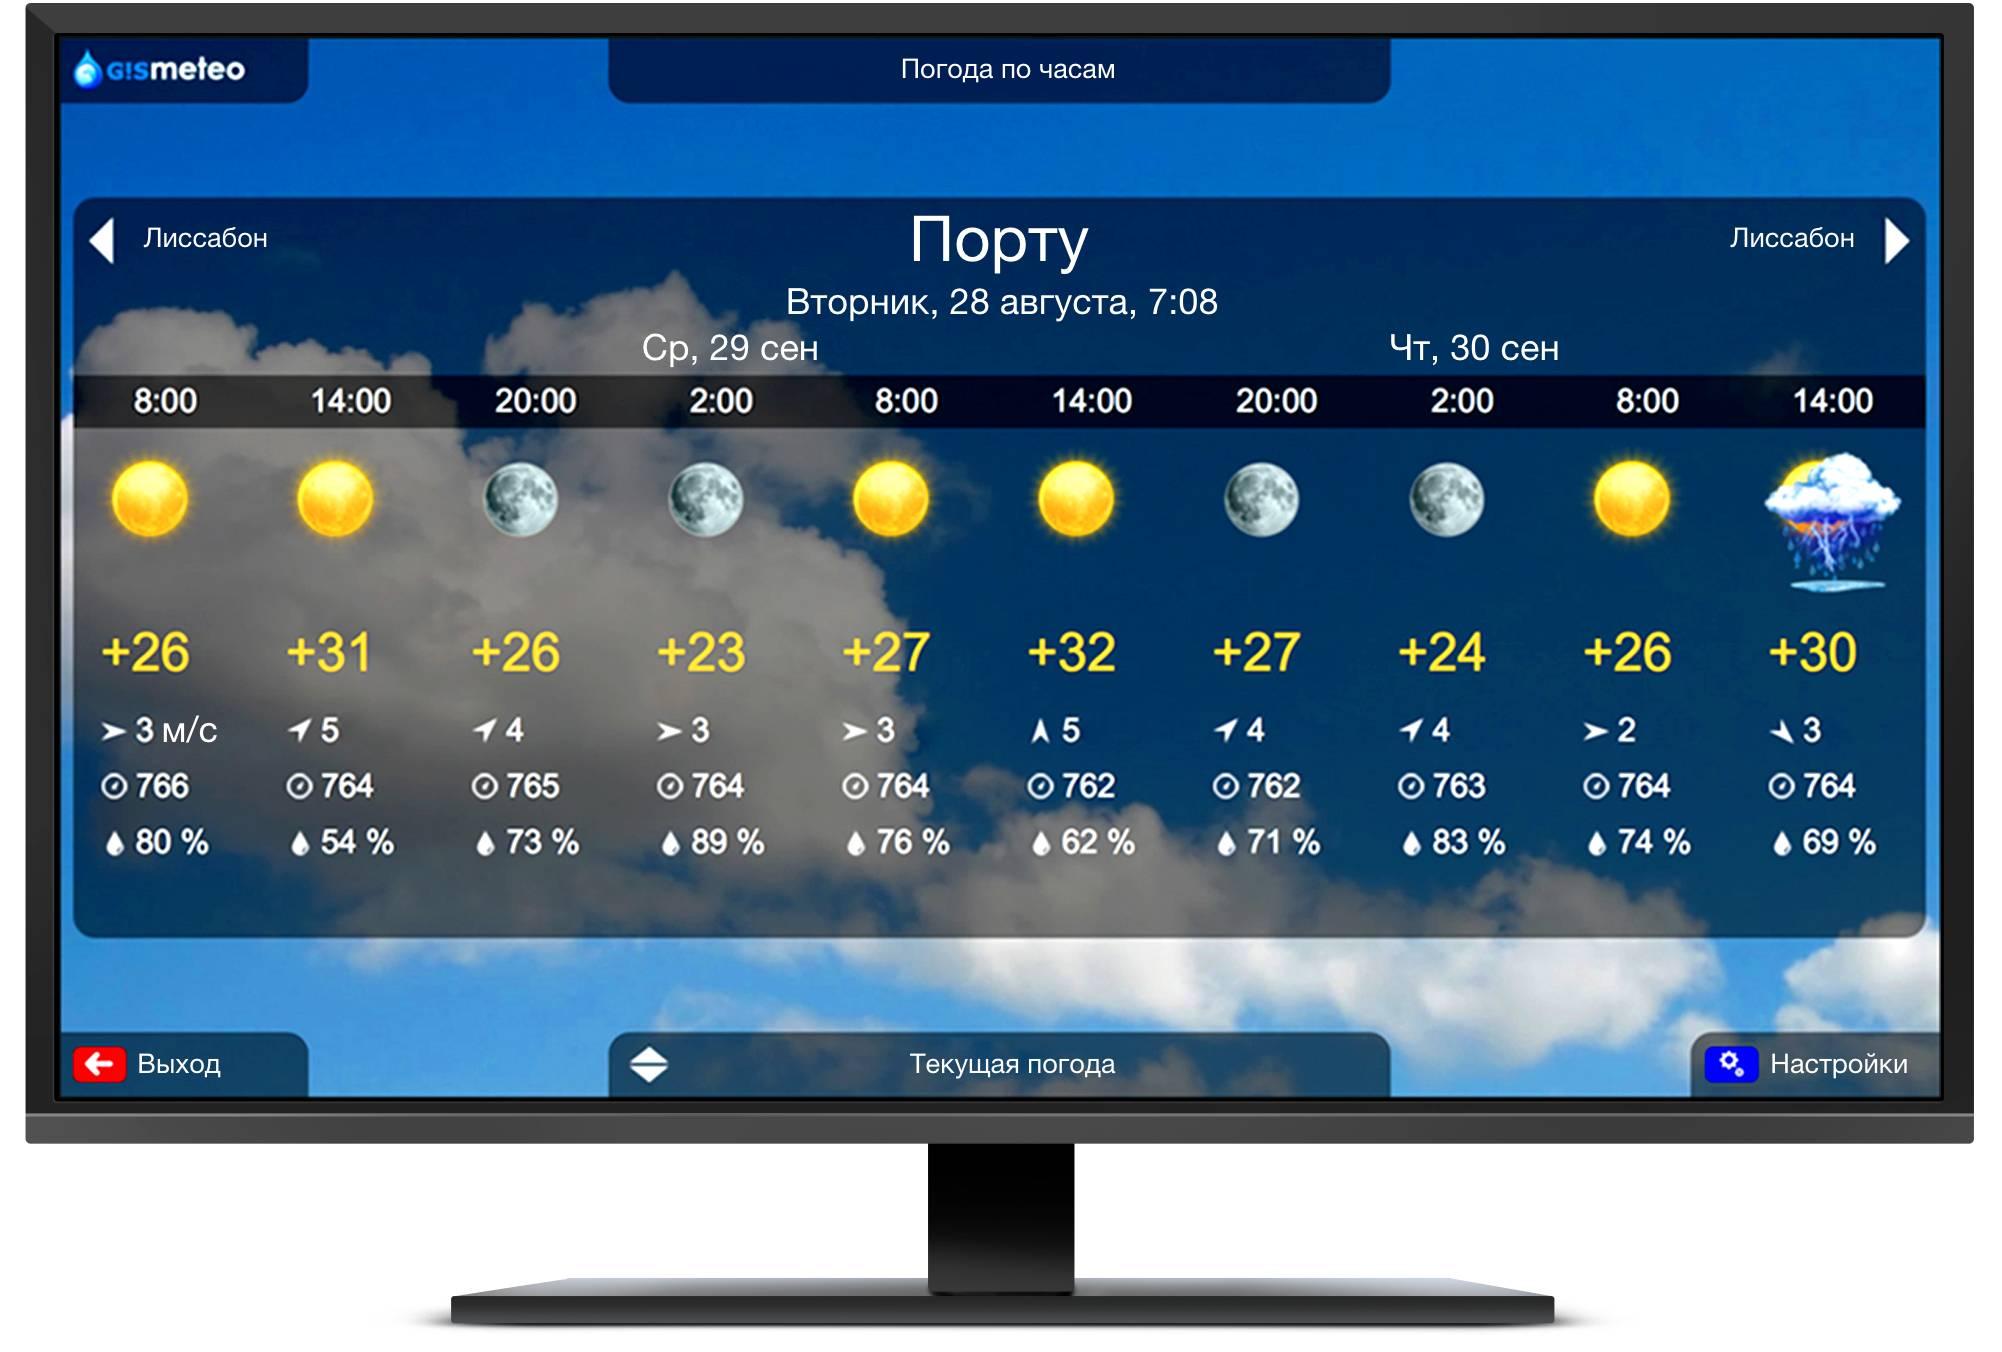 Топ приложений для СМАРТ ТВ - gismeteo на смарт тв